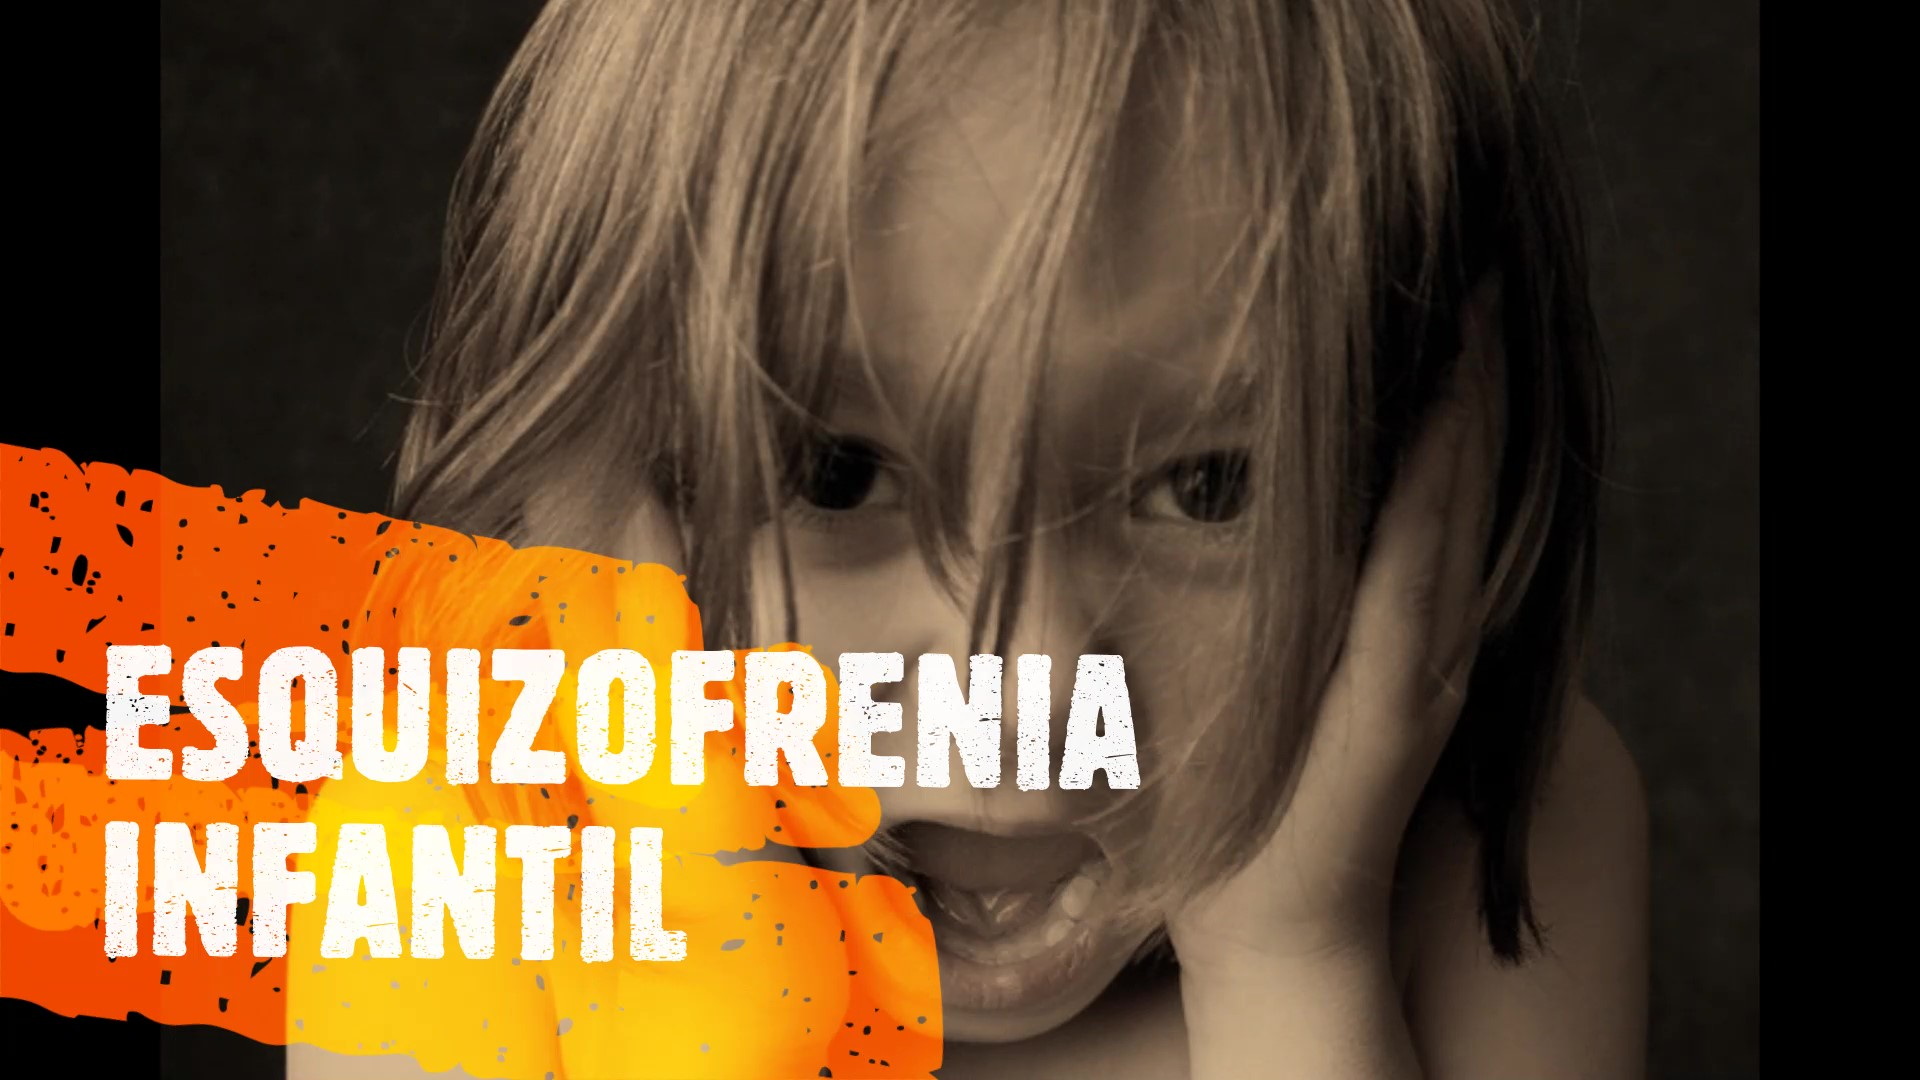 Esquizofrenia infantil. ¿Qué se sabe realmente?